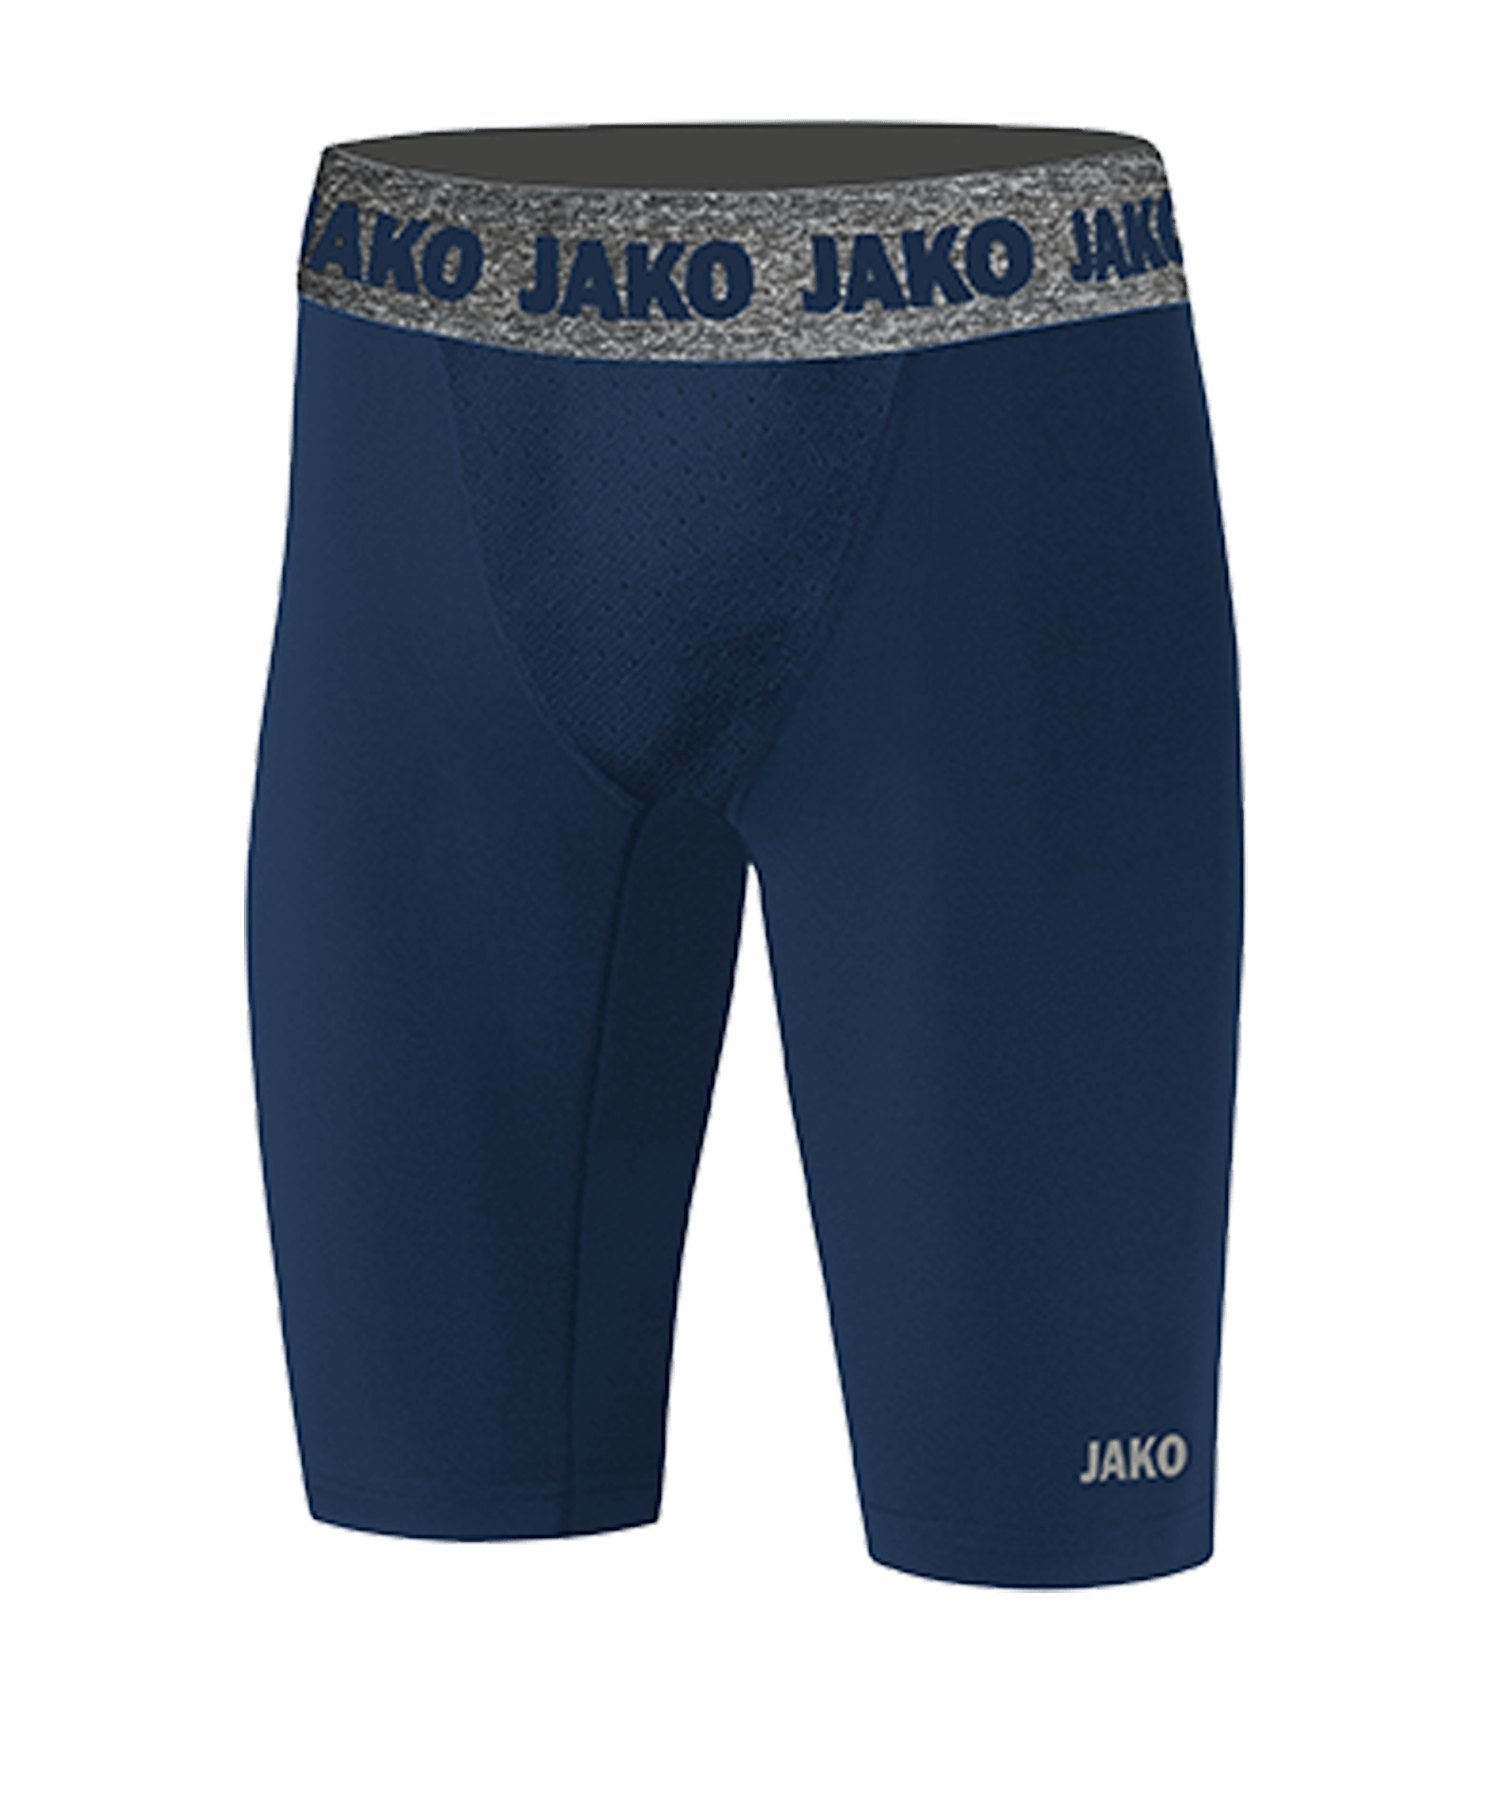 JAKO Compression 2.0 Tight Short Blau F09 - blau